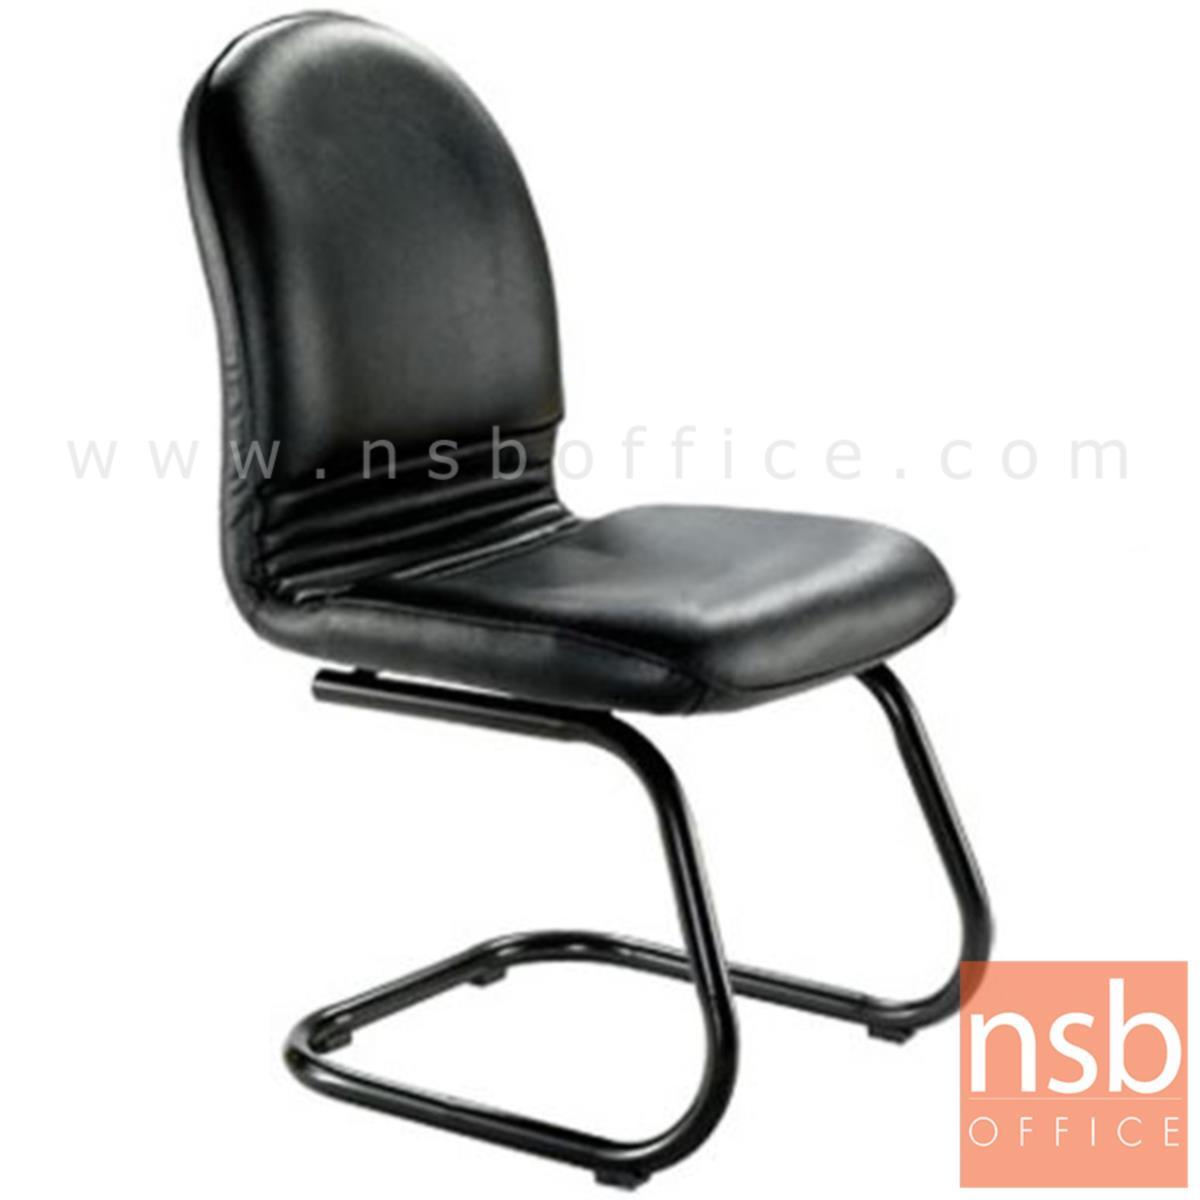 B04A155:เก้าอี้รับแขกขาตัวซี รุ่น Red Ribbon  ขาเหล็กพ่นดำ